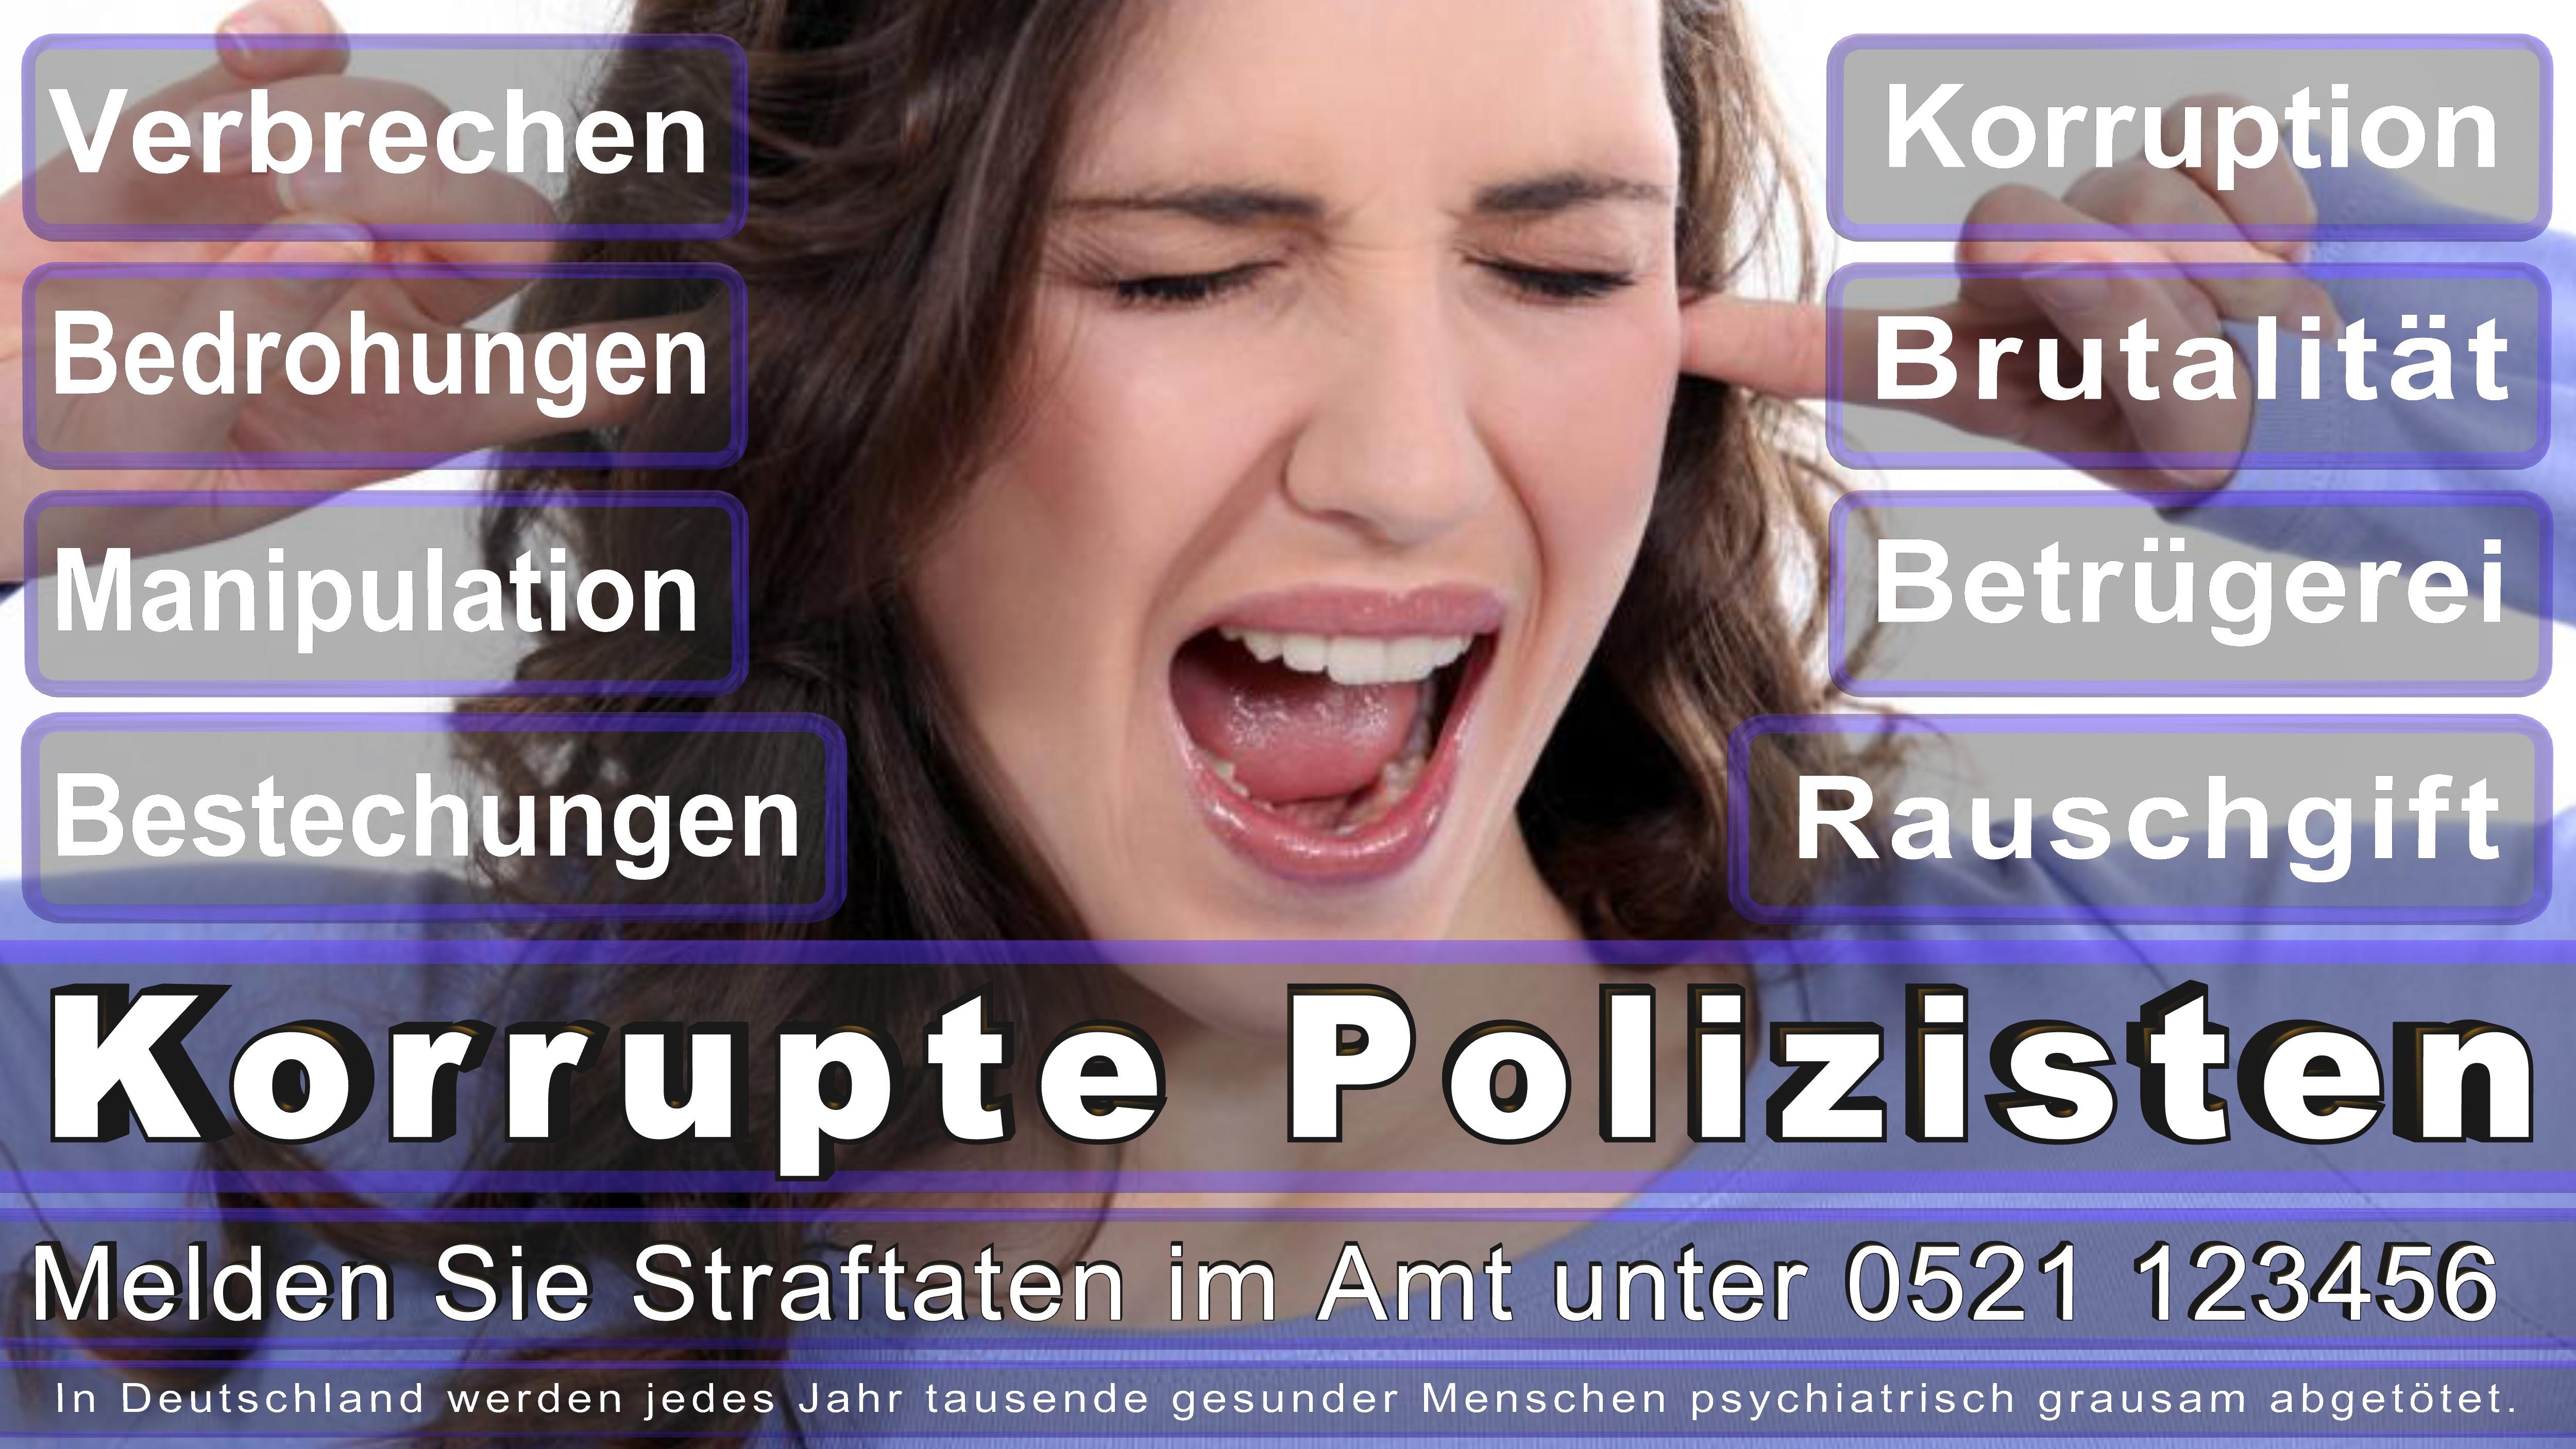 Polizei-Bielefeld-Polizei-Bielefeld-Polizei-Bielefeld (164)